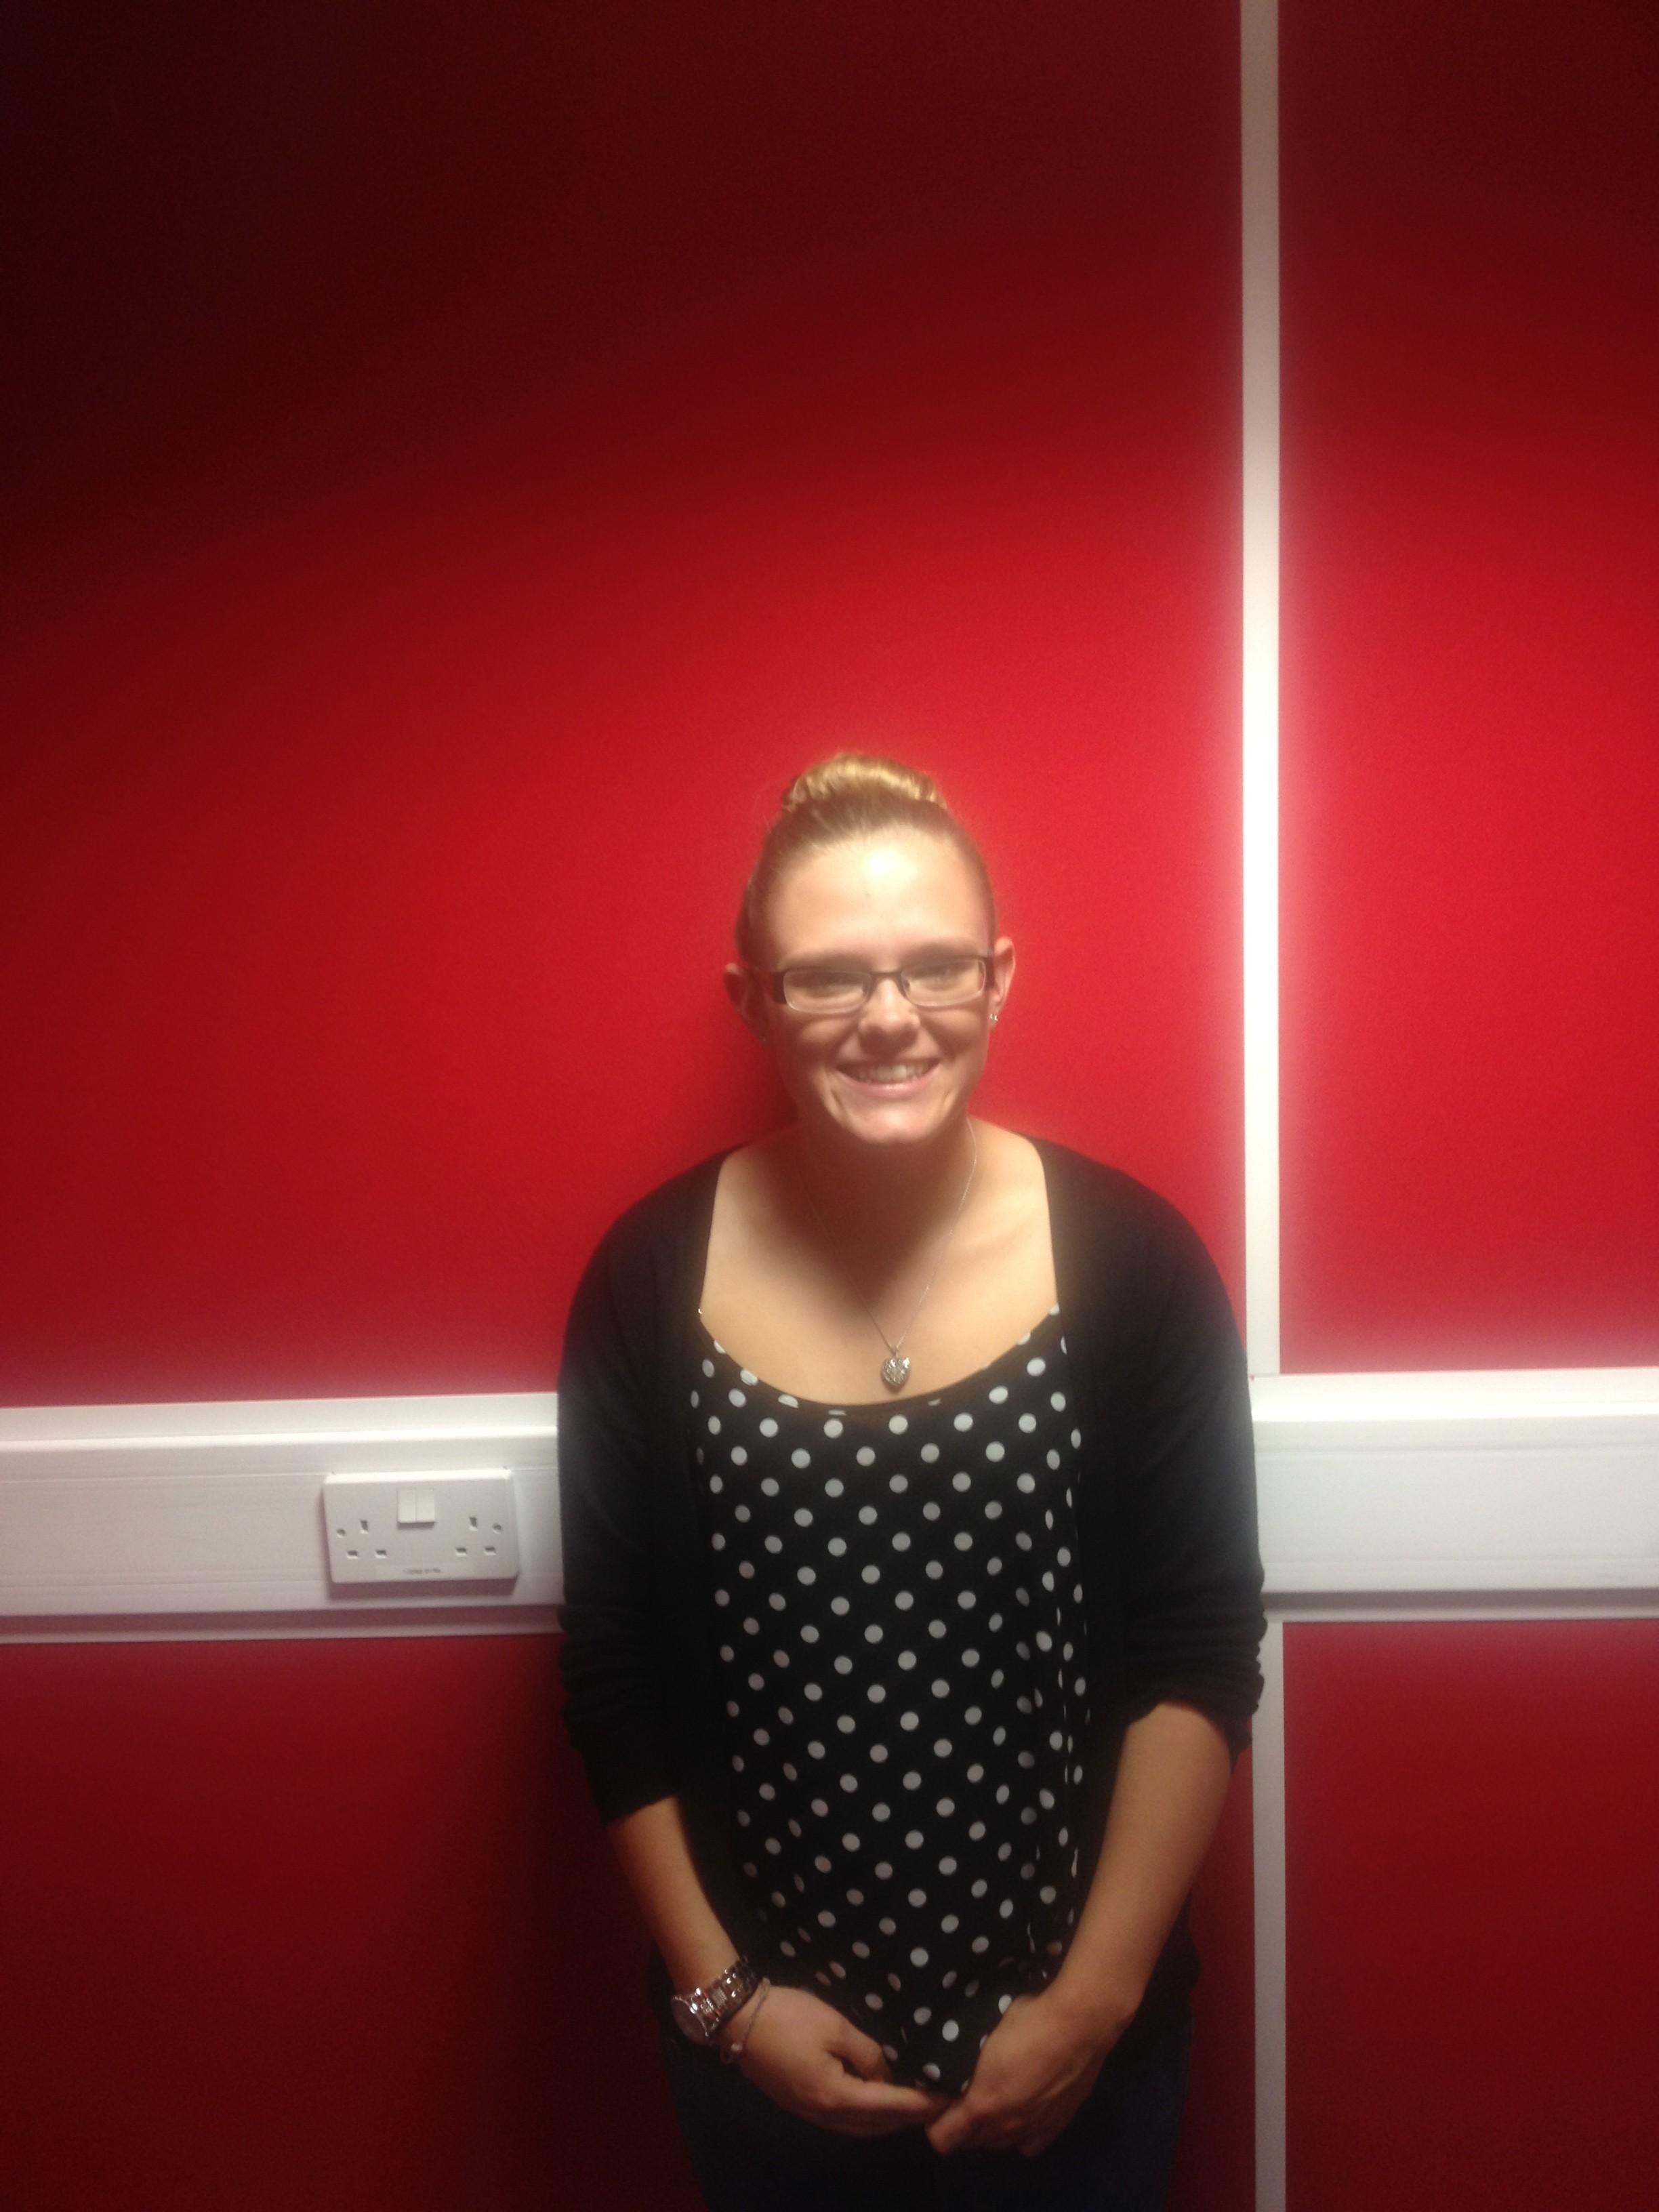 GB rising star backs female rights